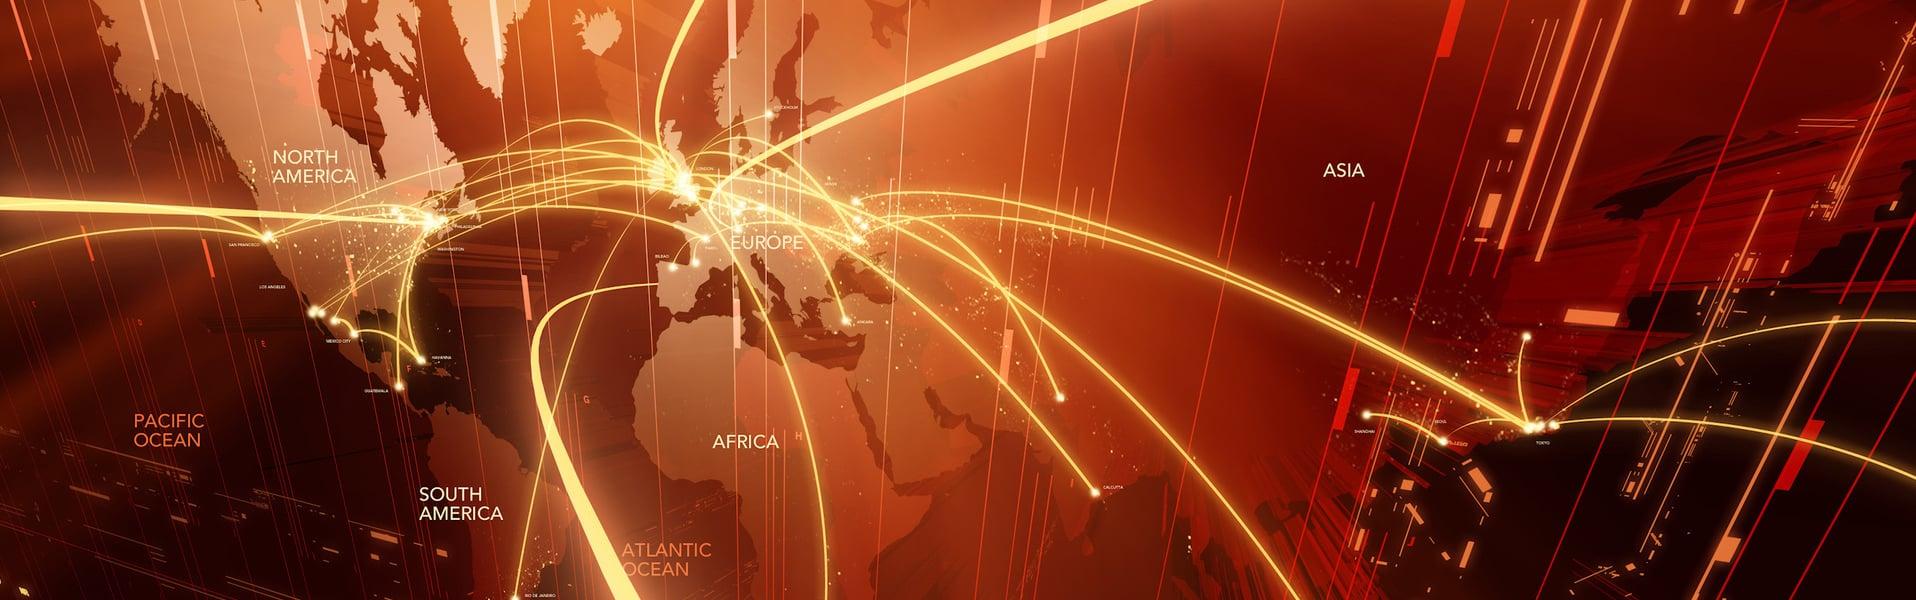 maplatency-network-banniere